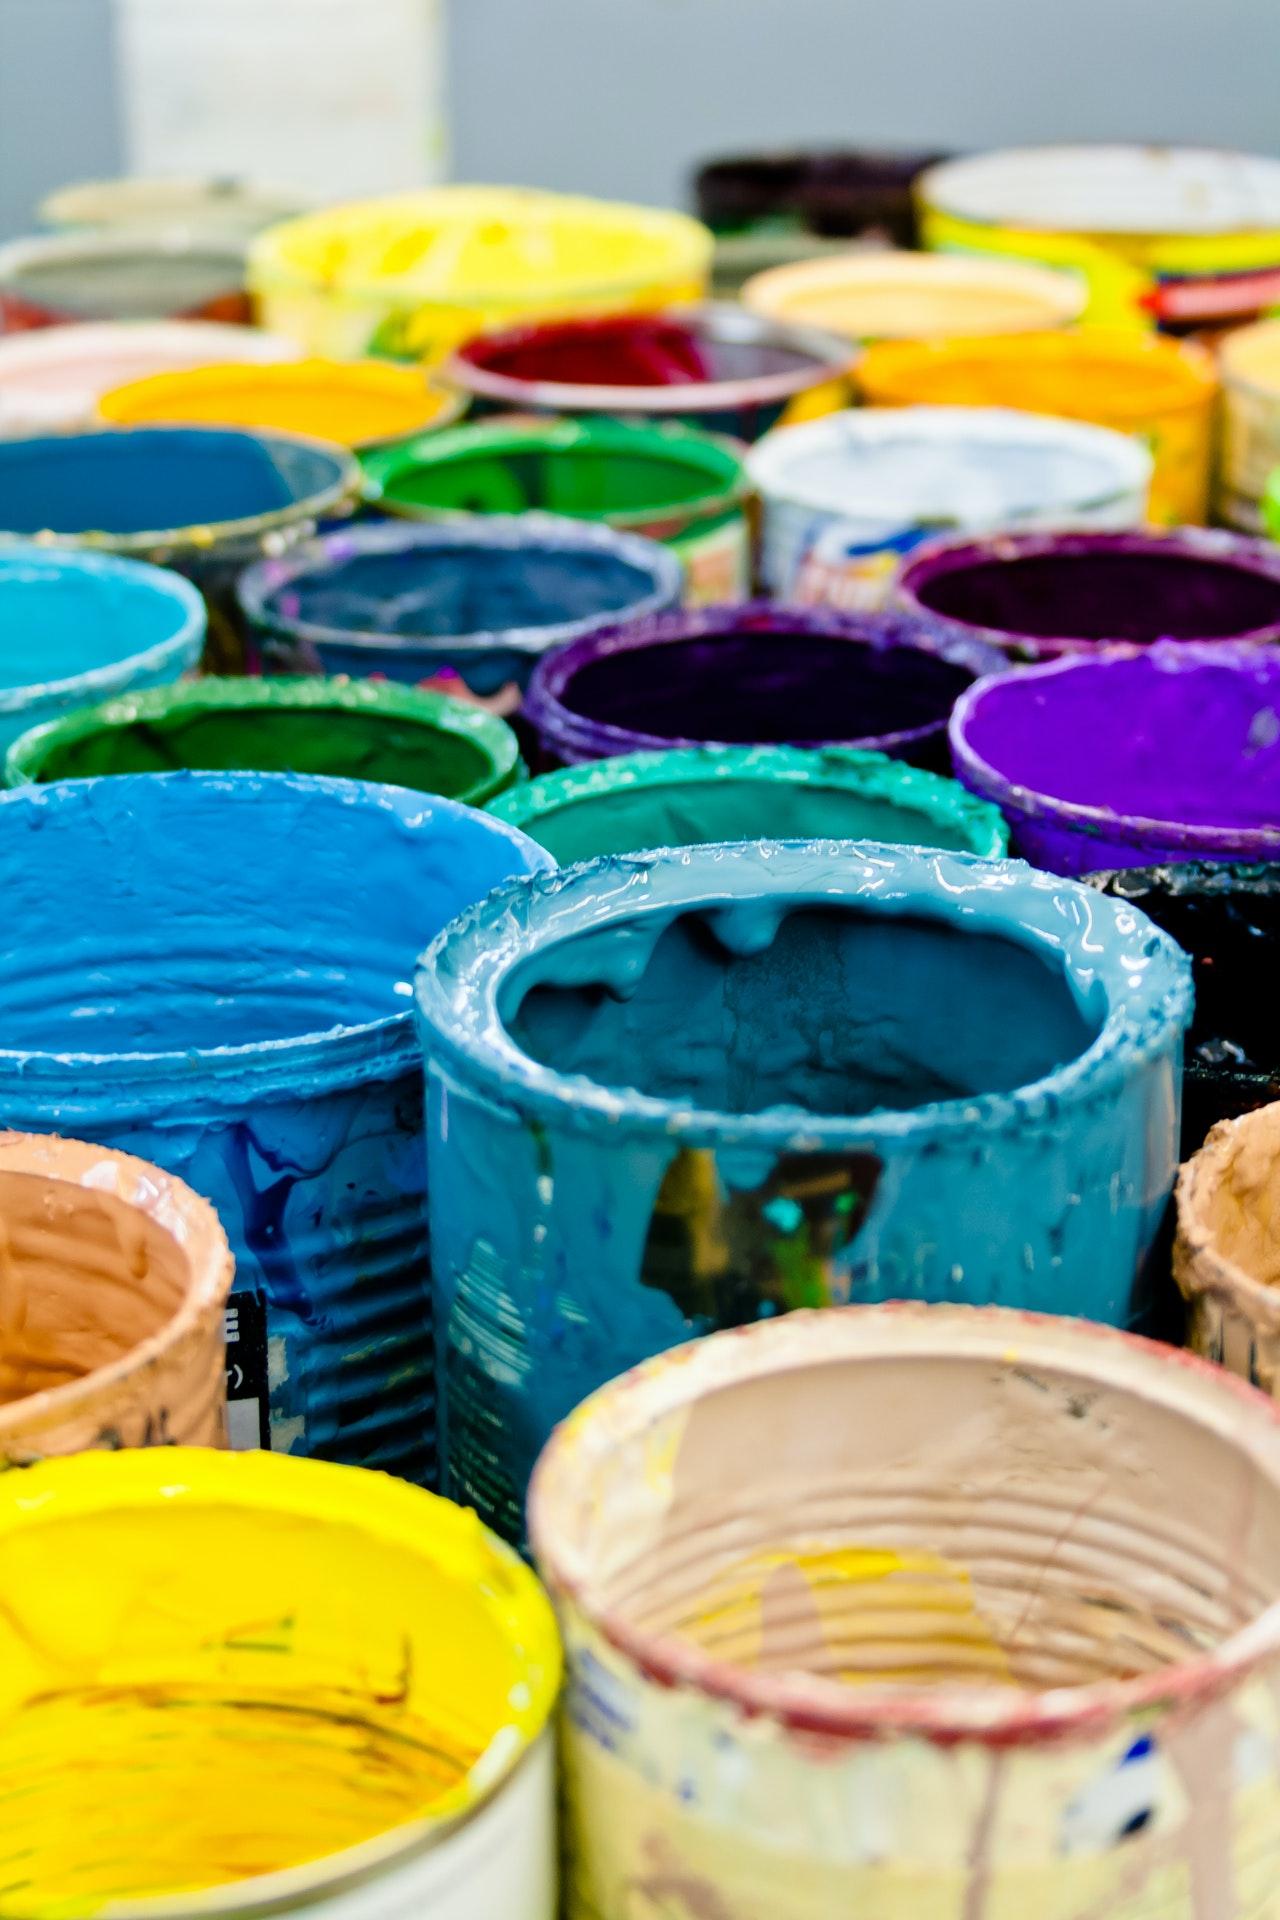 Bottom Paints in 2021: Modern Eco-Friendly Antifouling Coatings